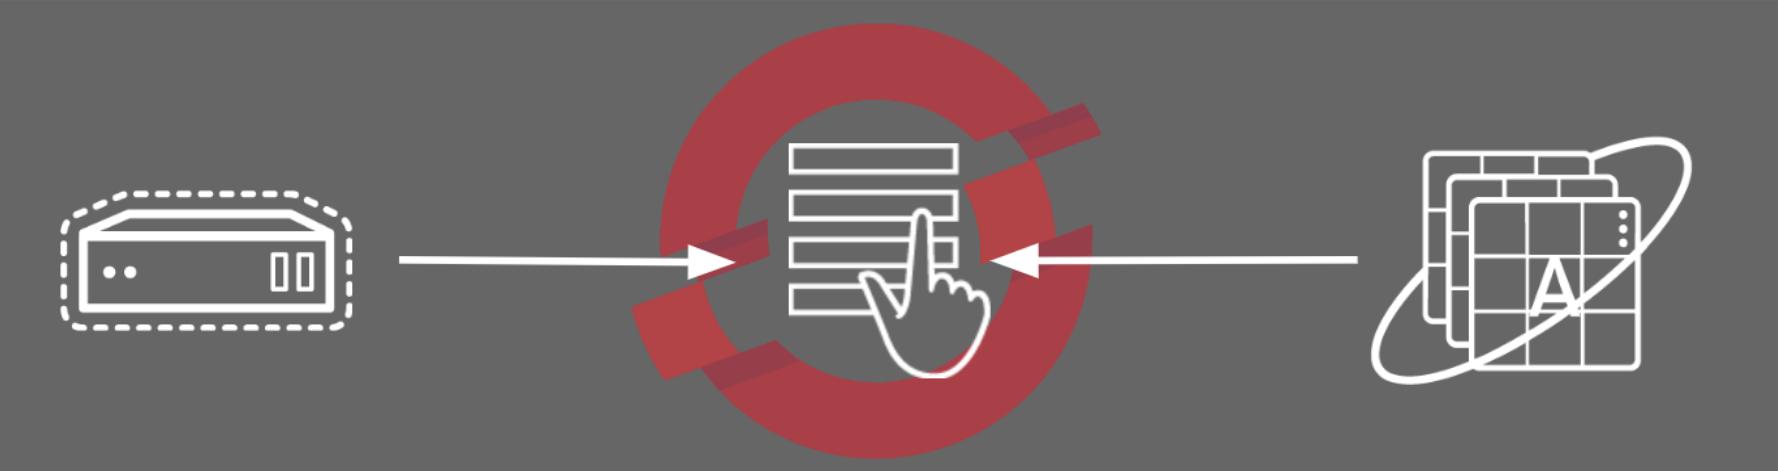 VM workloads on OpenShift